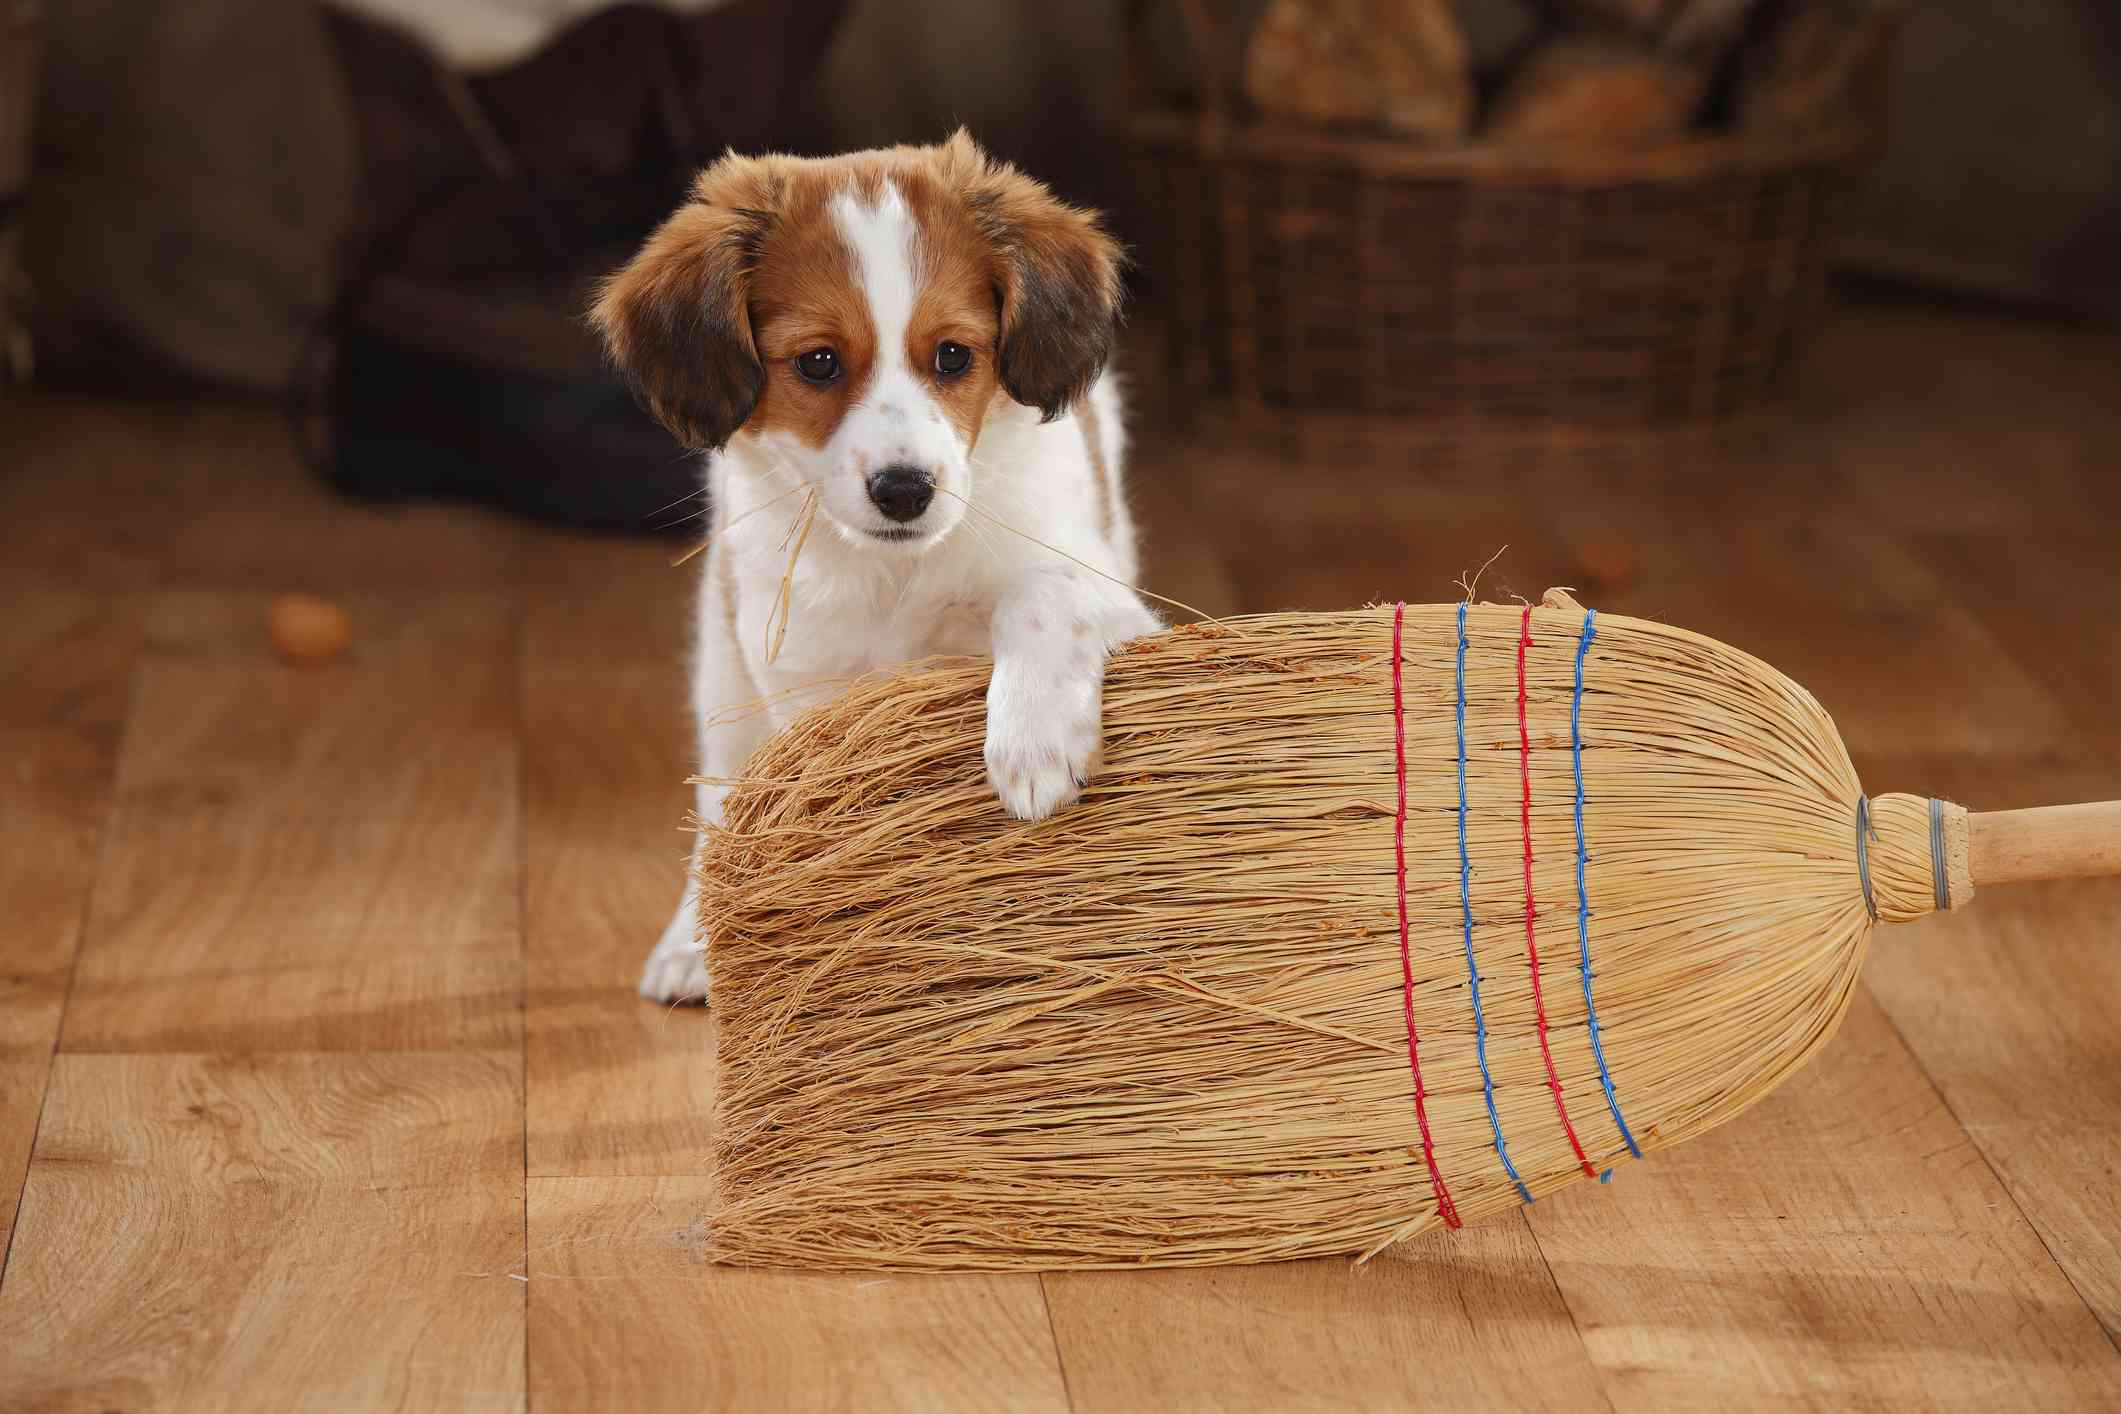 Kooikerhondje puppy playing with broom